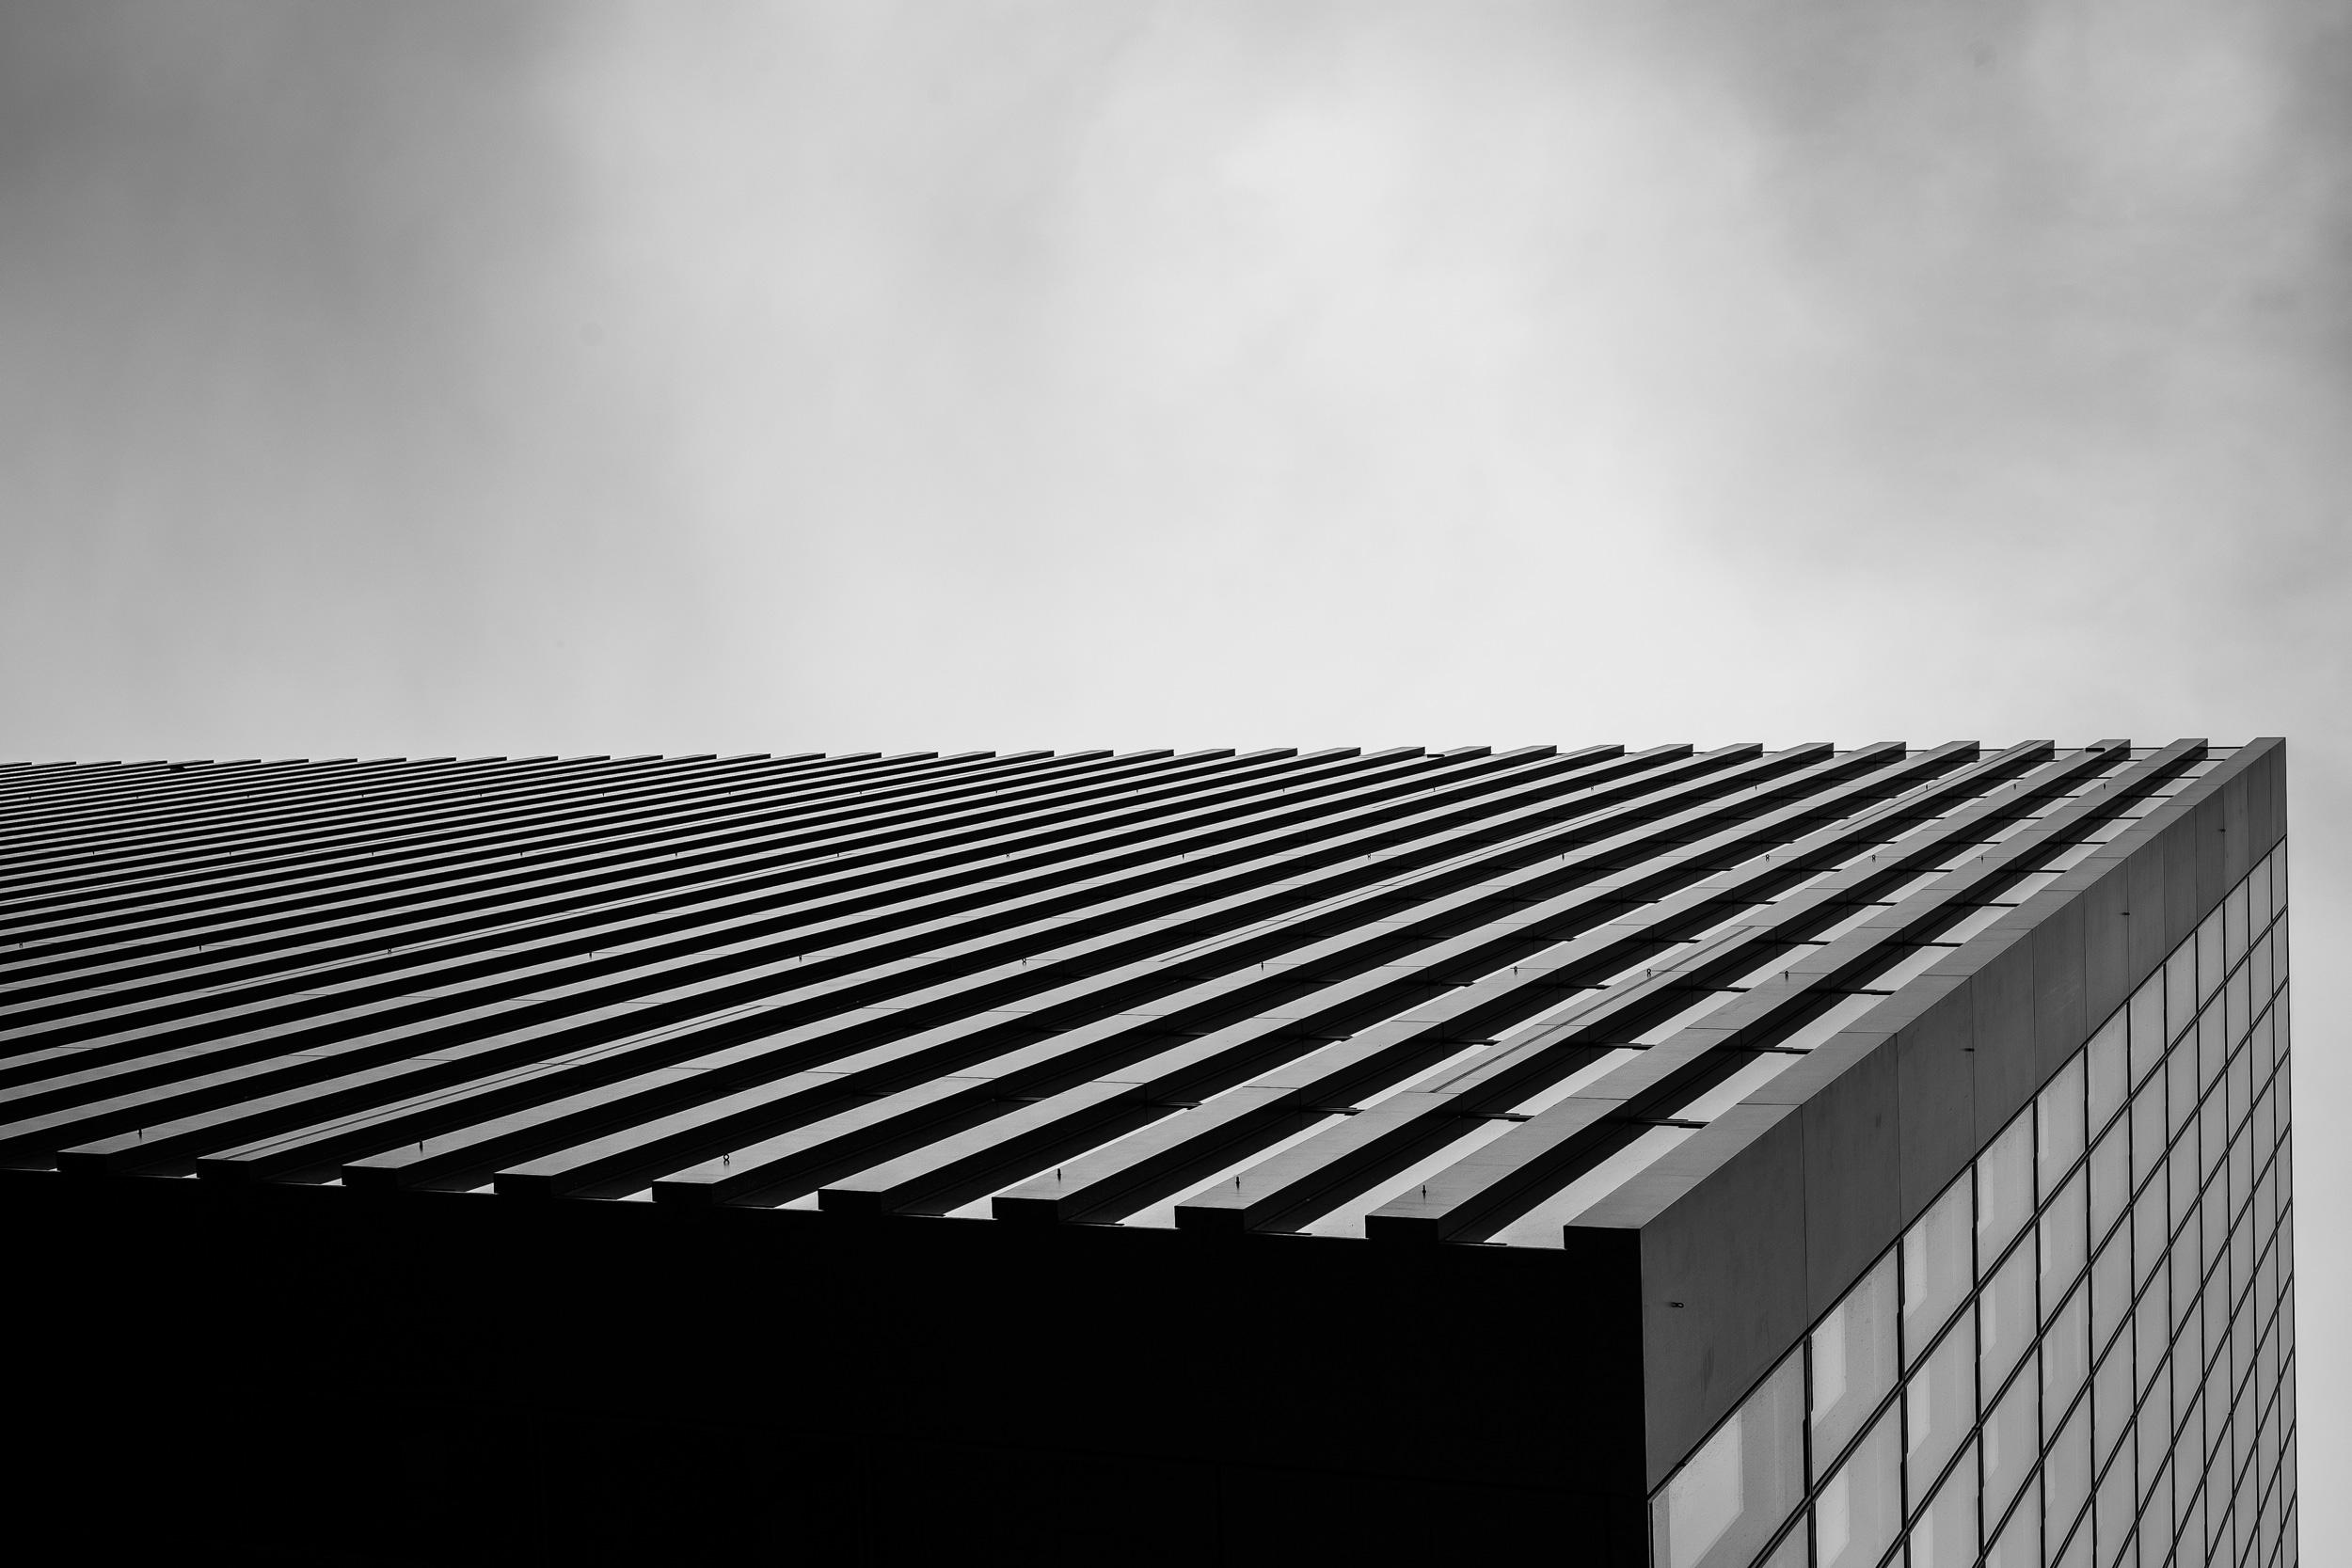 schnappschuss-58-perspektiven-in-der-fotografie-horizontal